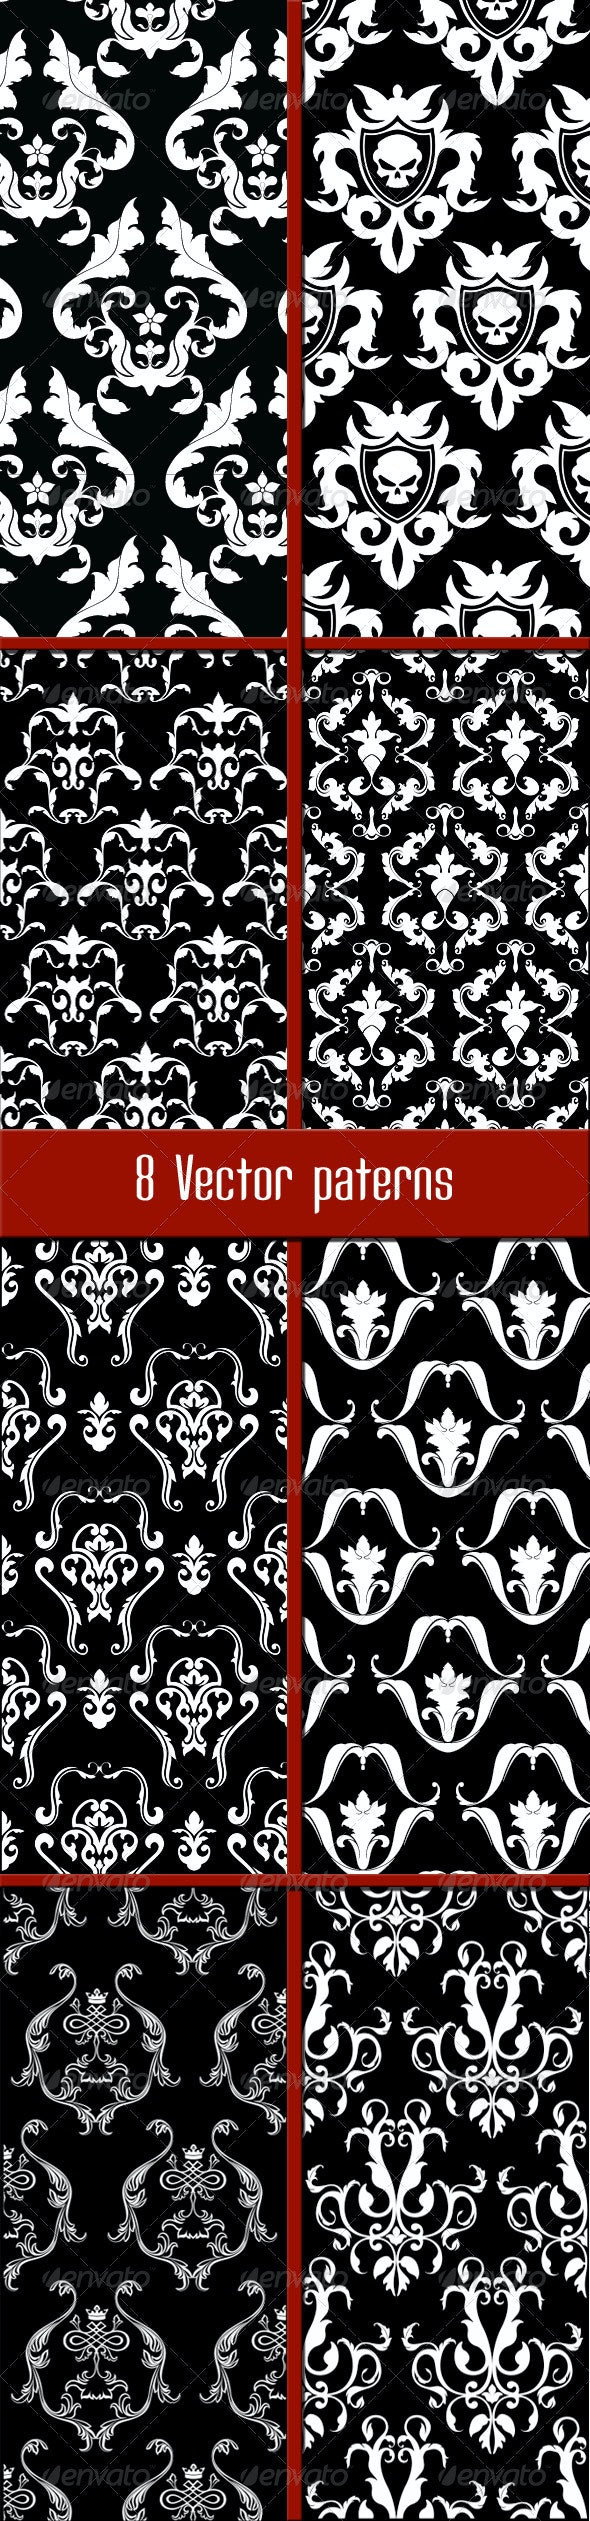 8 Patterns - Patterns Decorative